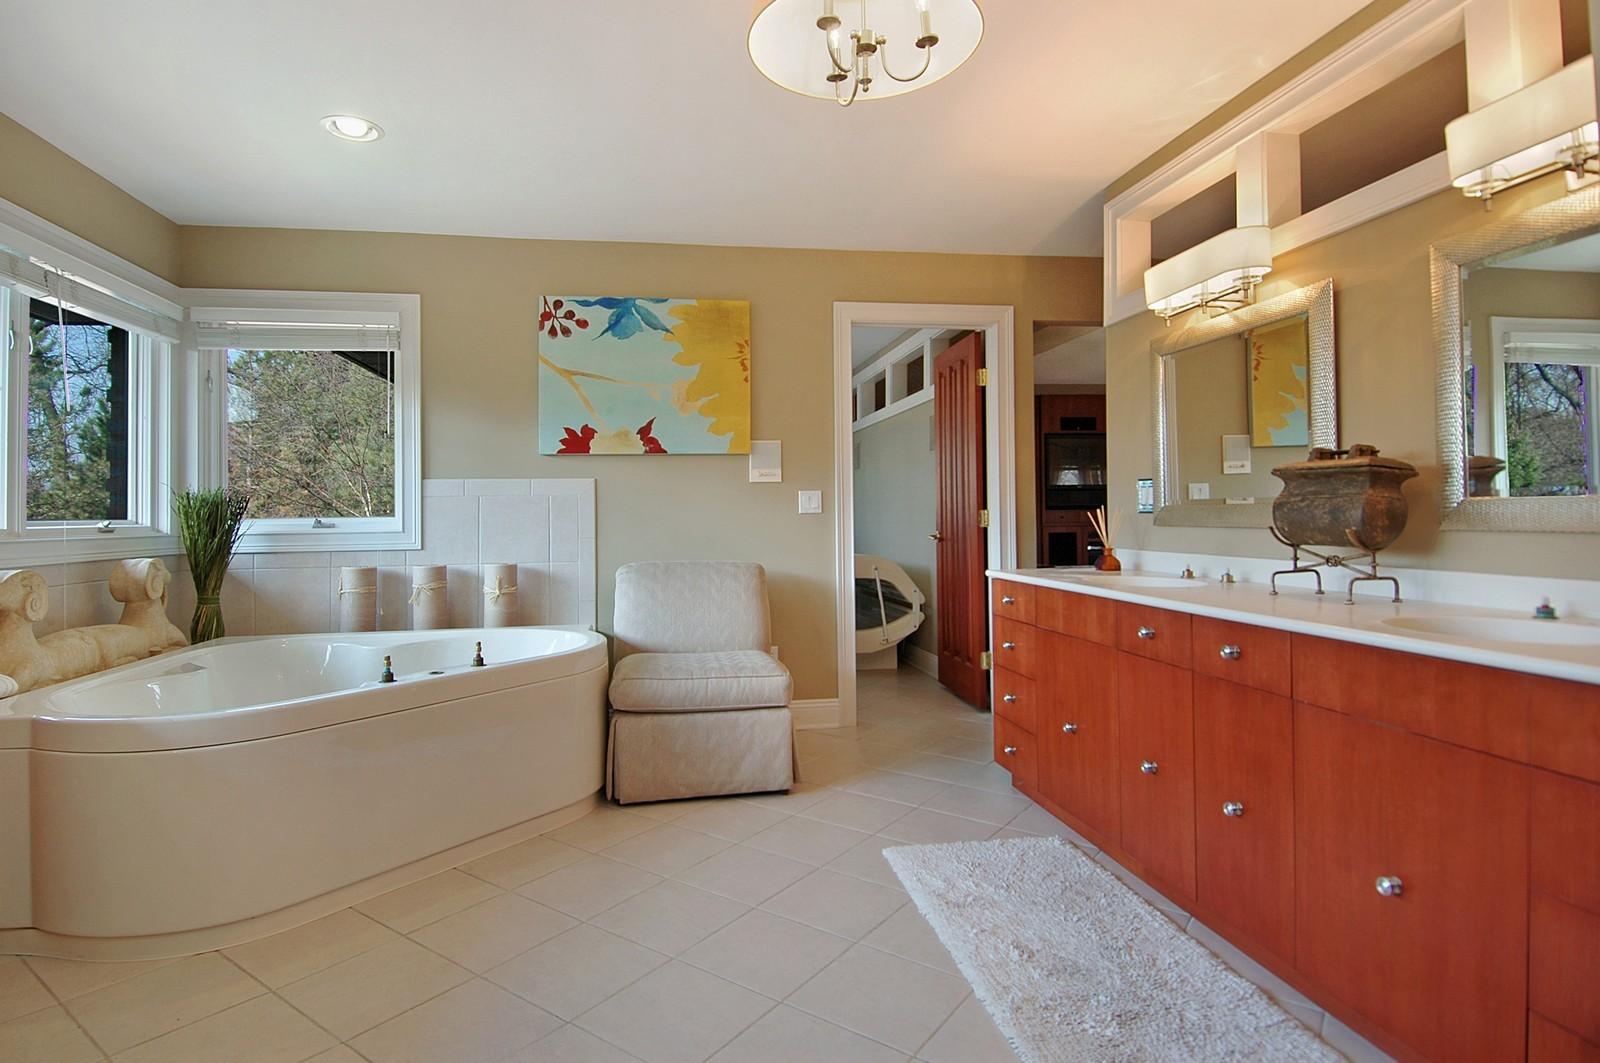 Real Estate Photography - 751 Lake, Crystal Lake, IL, 60014 - Master Bathroom